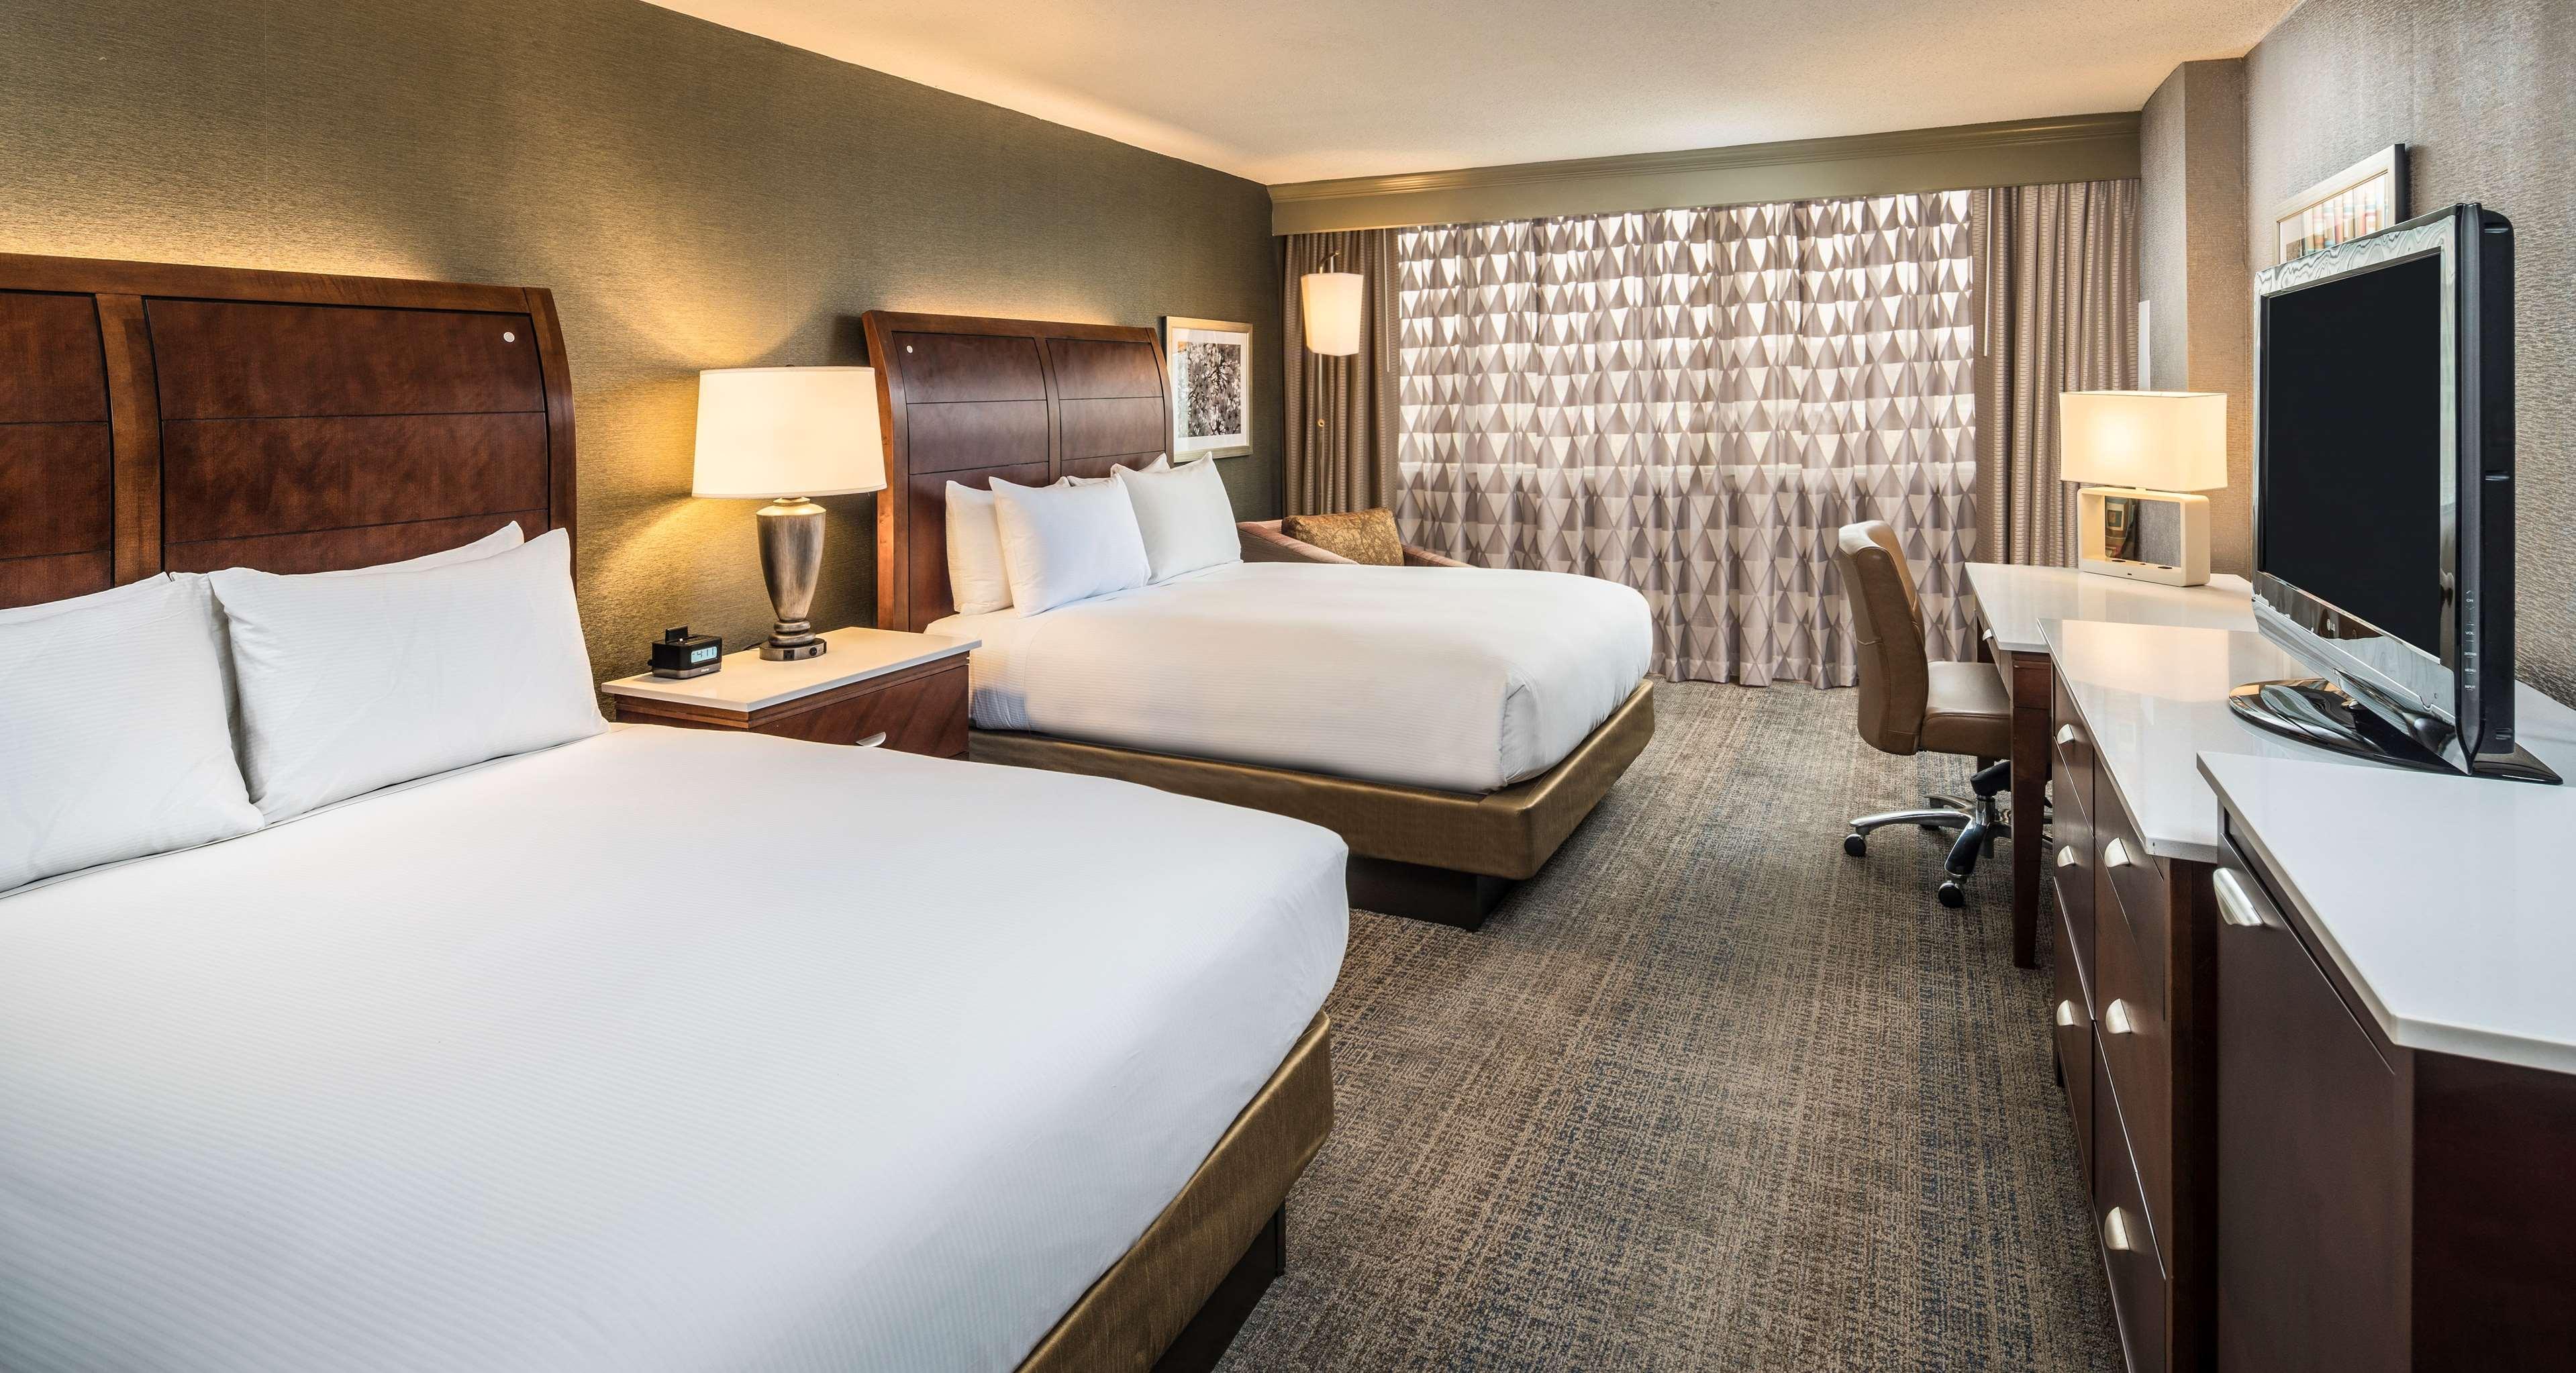 Hilton Washington DC/Rockville Hotel & Executive Meeting Ctr image 34